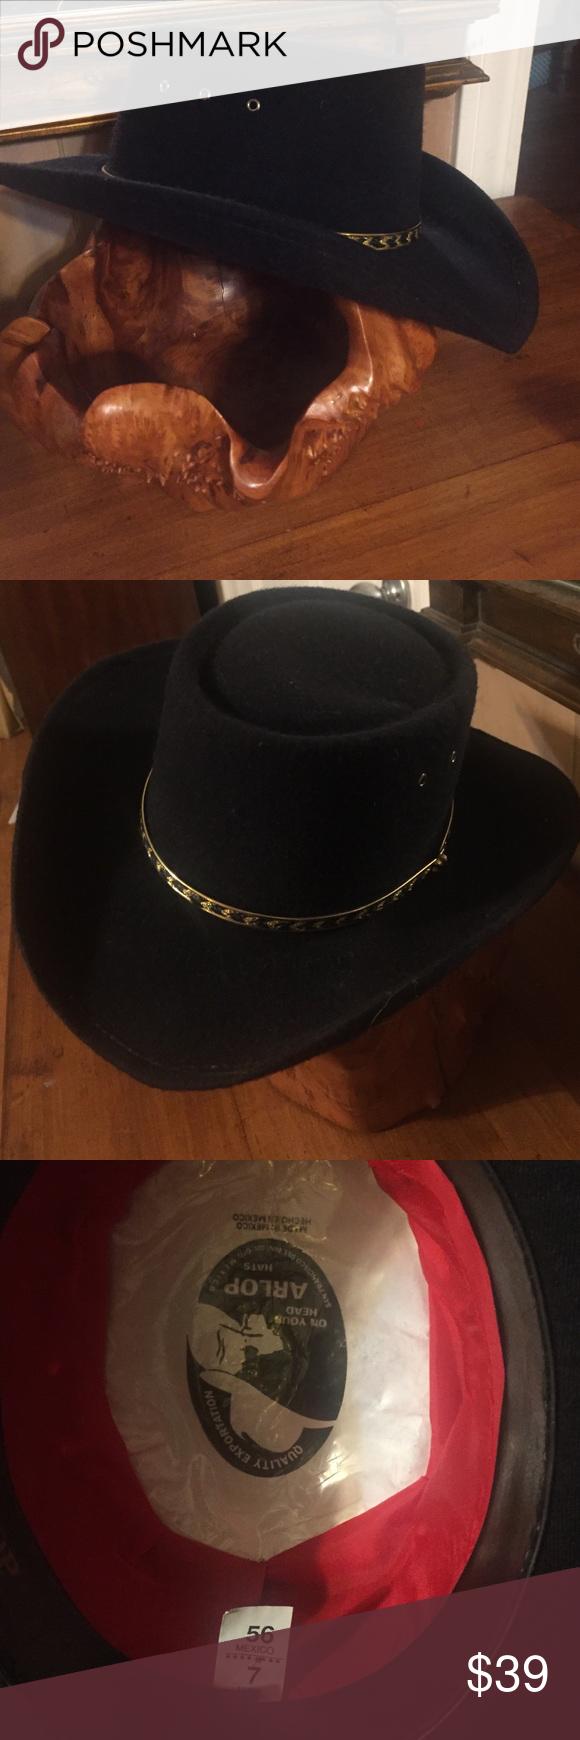 Vintage Arlop Black Cowboy Hat Size 7 Black Cowboy Hat Cowboy Hats Vintage Accessories